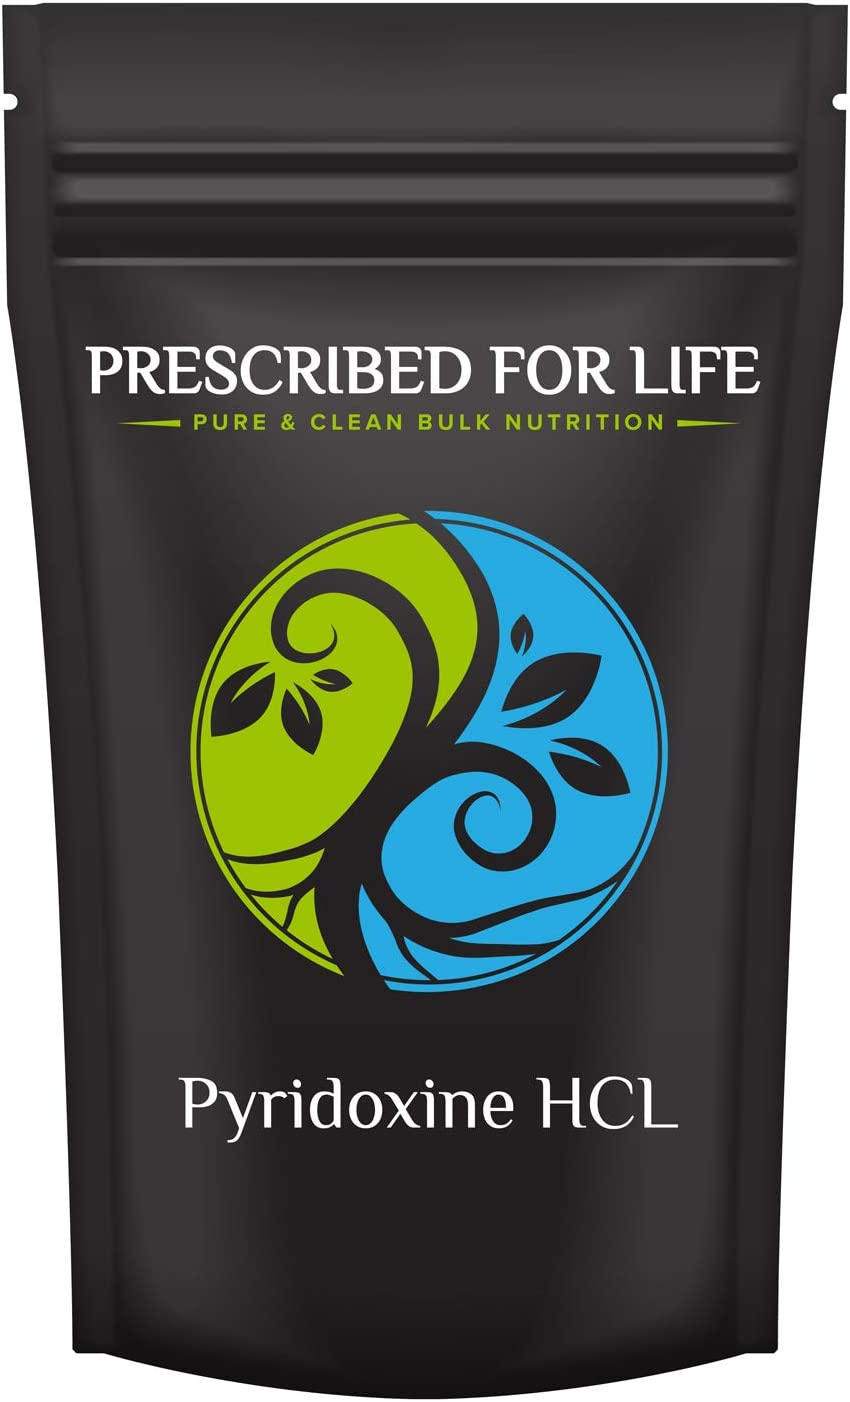 Prescribed for Life Pyridoxine HCL - USP Food Grade Vitamin B-6 Powder, 2 oz (57 g)